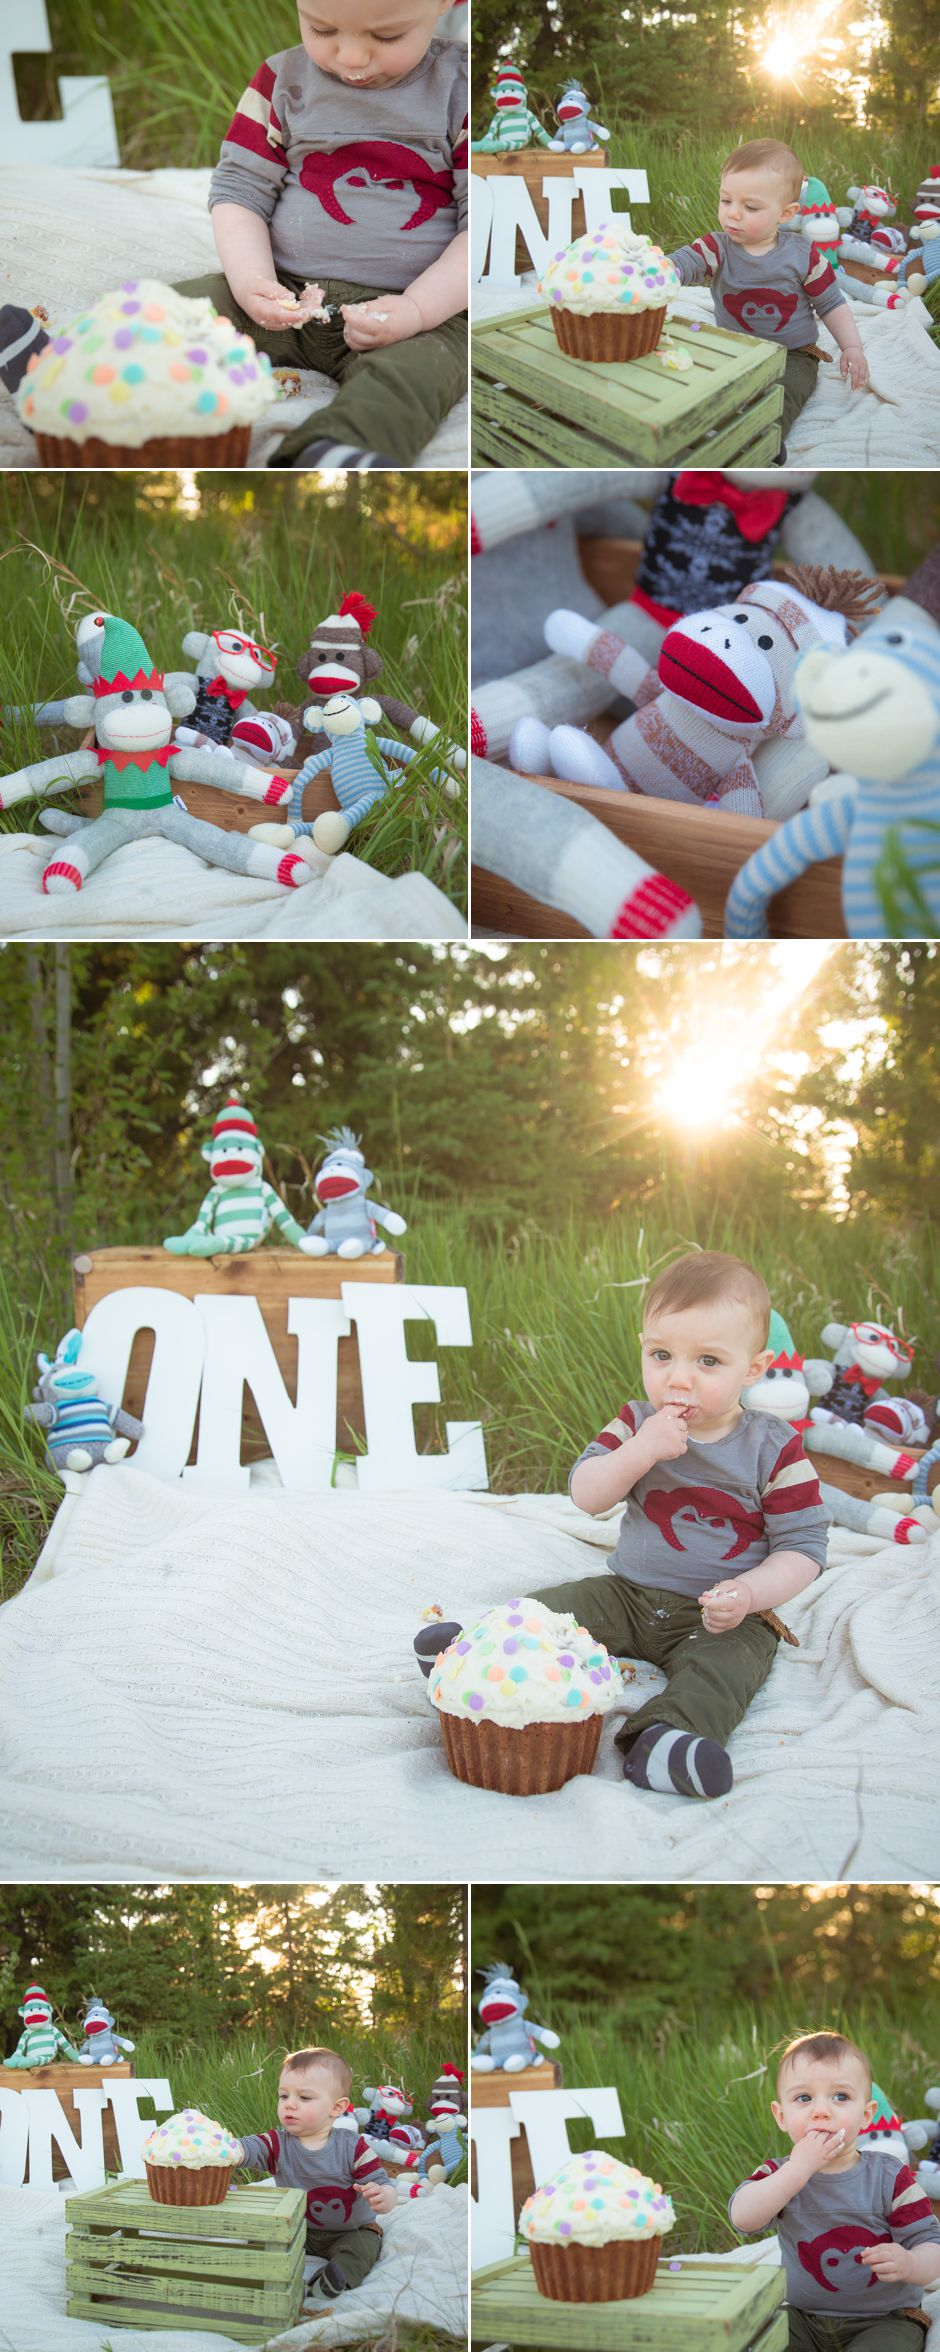 Edmonton Family PhotographerRoughley Originals 04